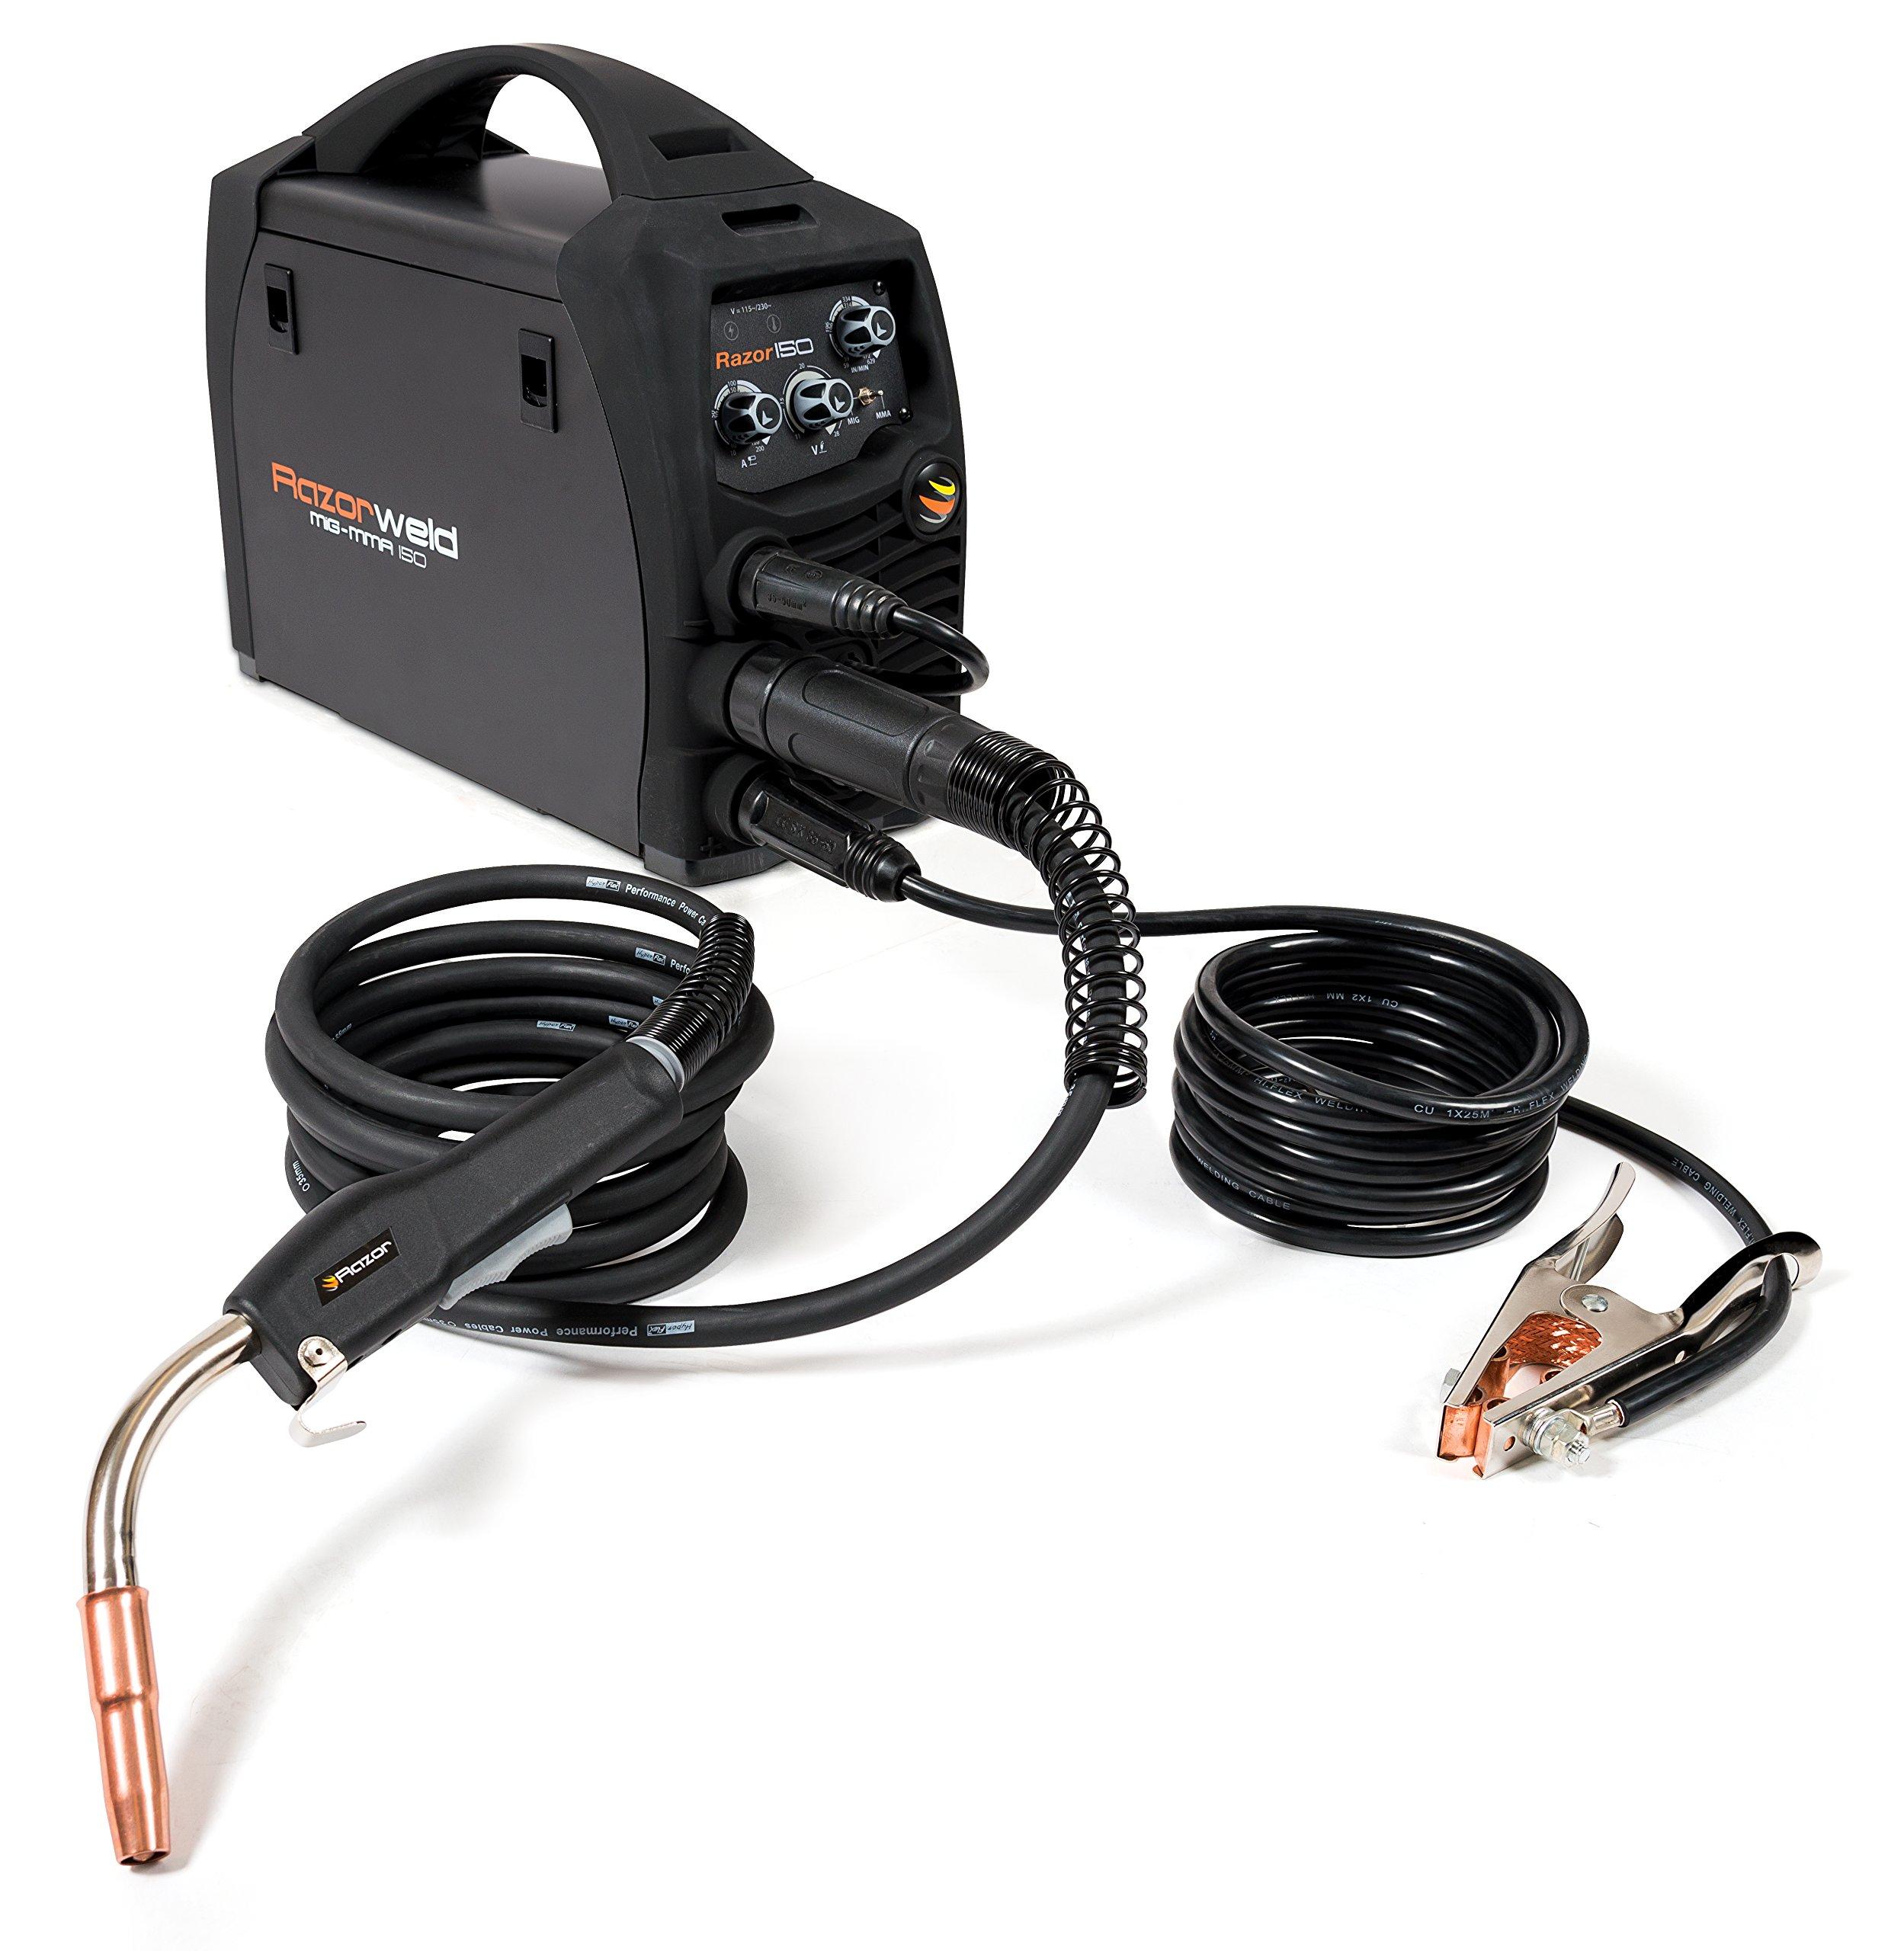 Titan PLKUMJRRW150 150 Amp Dual Volt Multi-system Welder